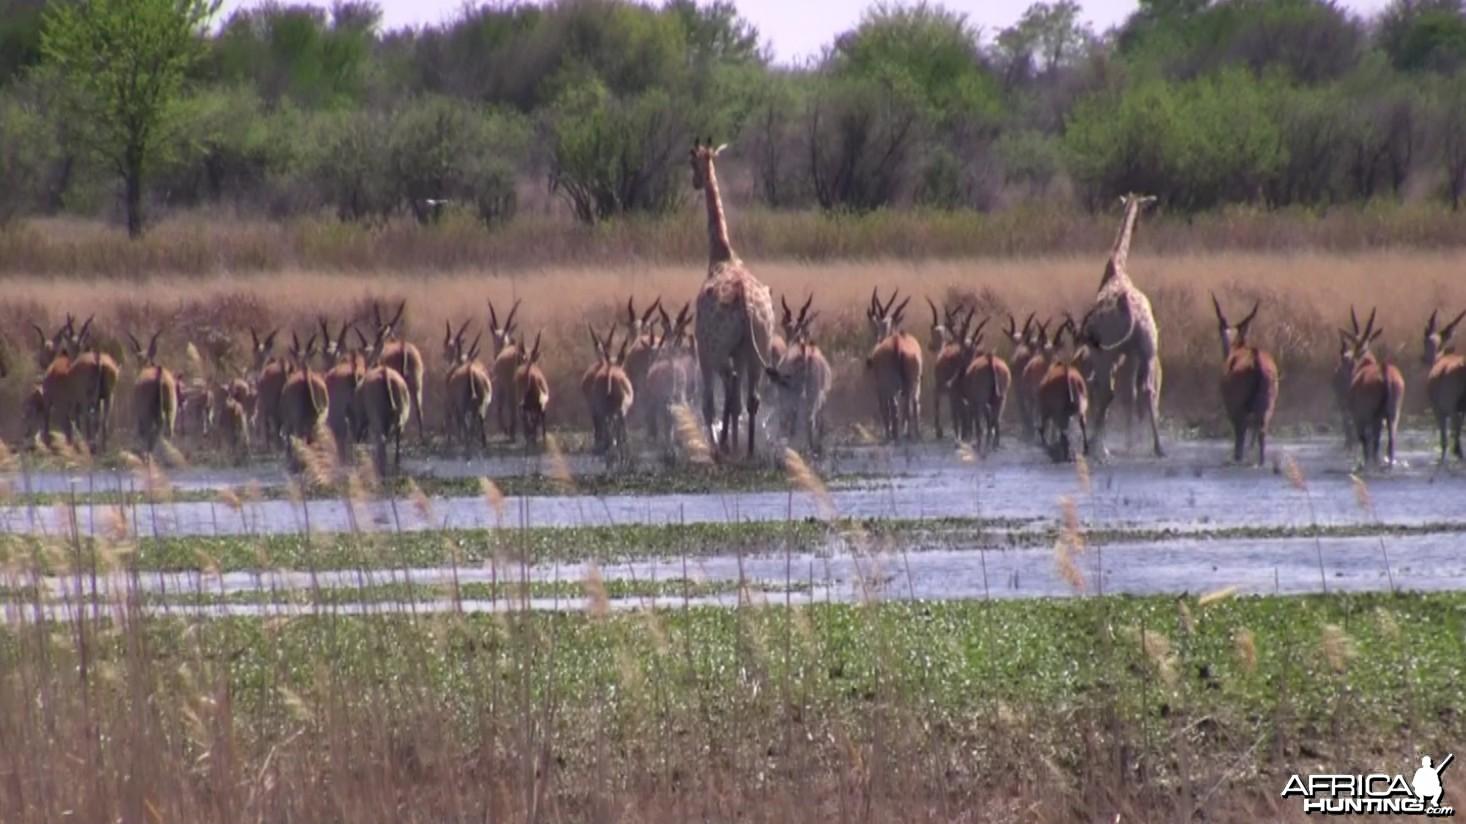 Thundering herd... Giraffe, Eland, Zebra, Impala...